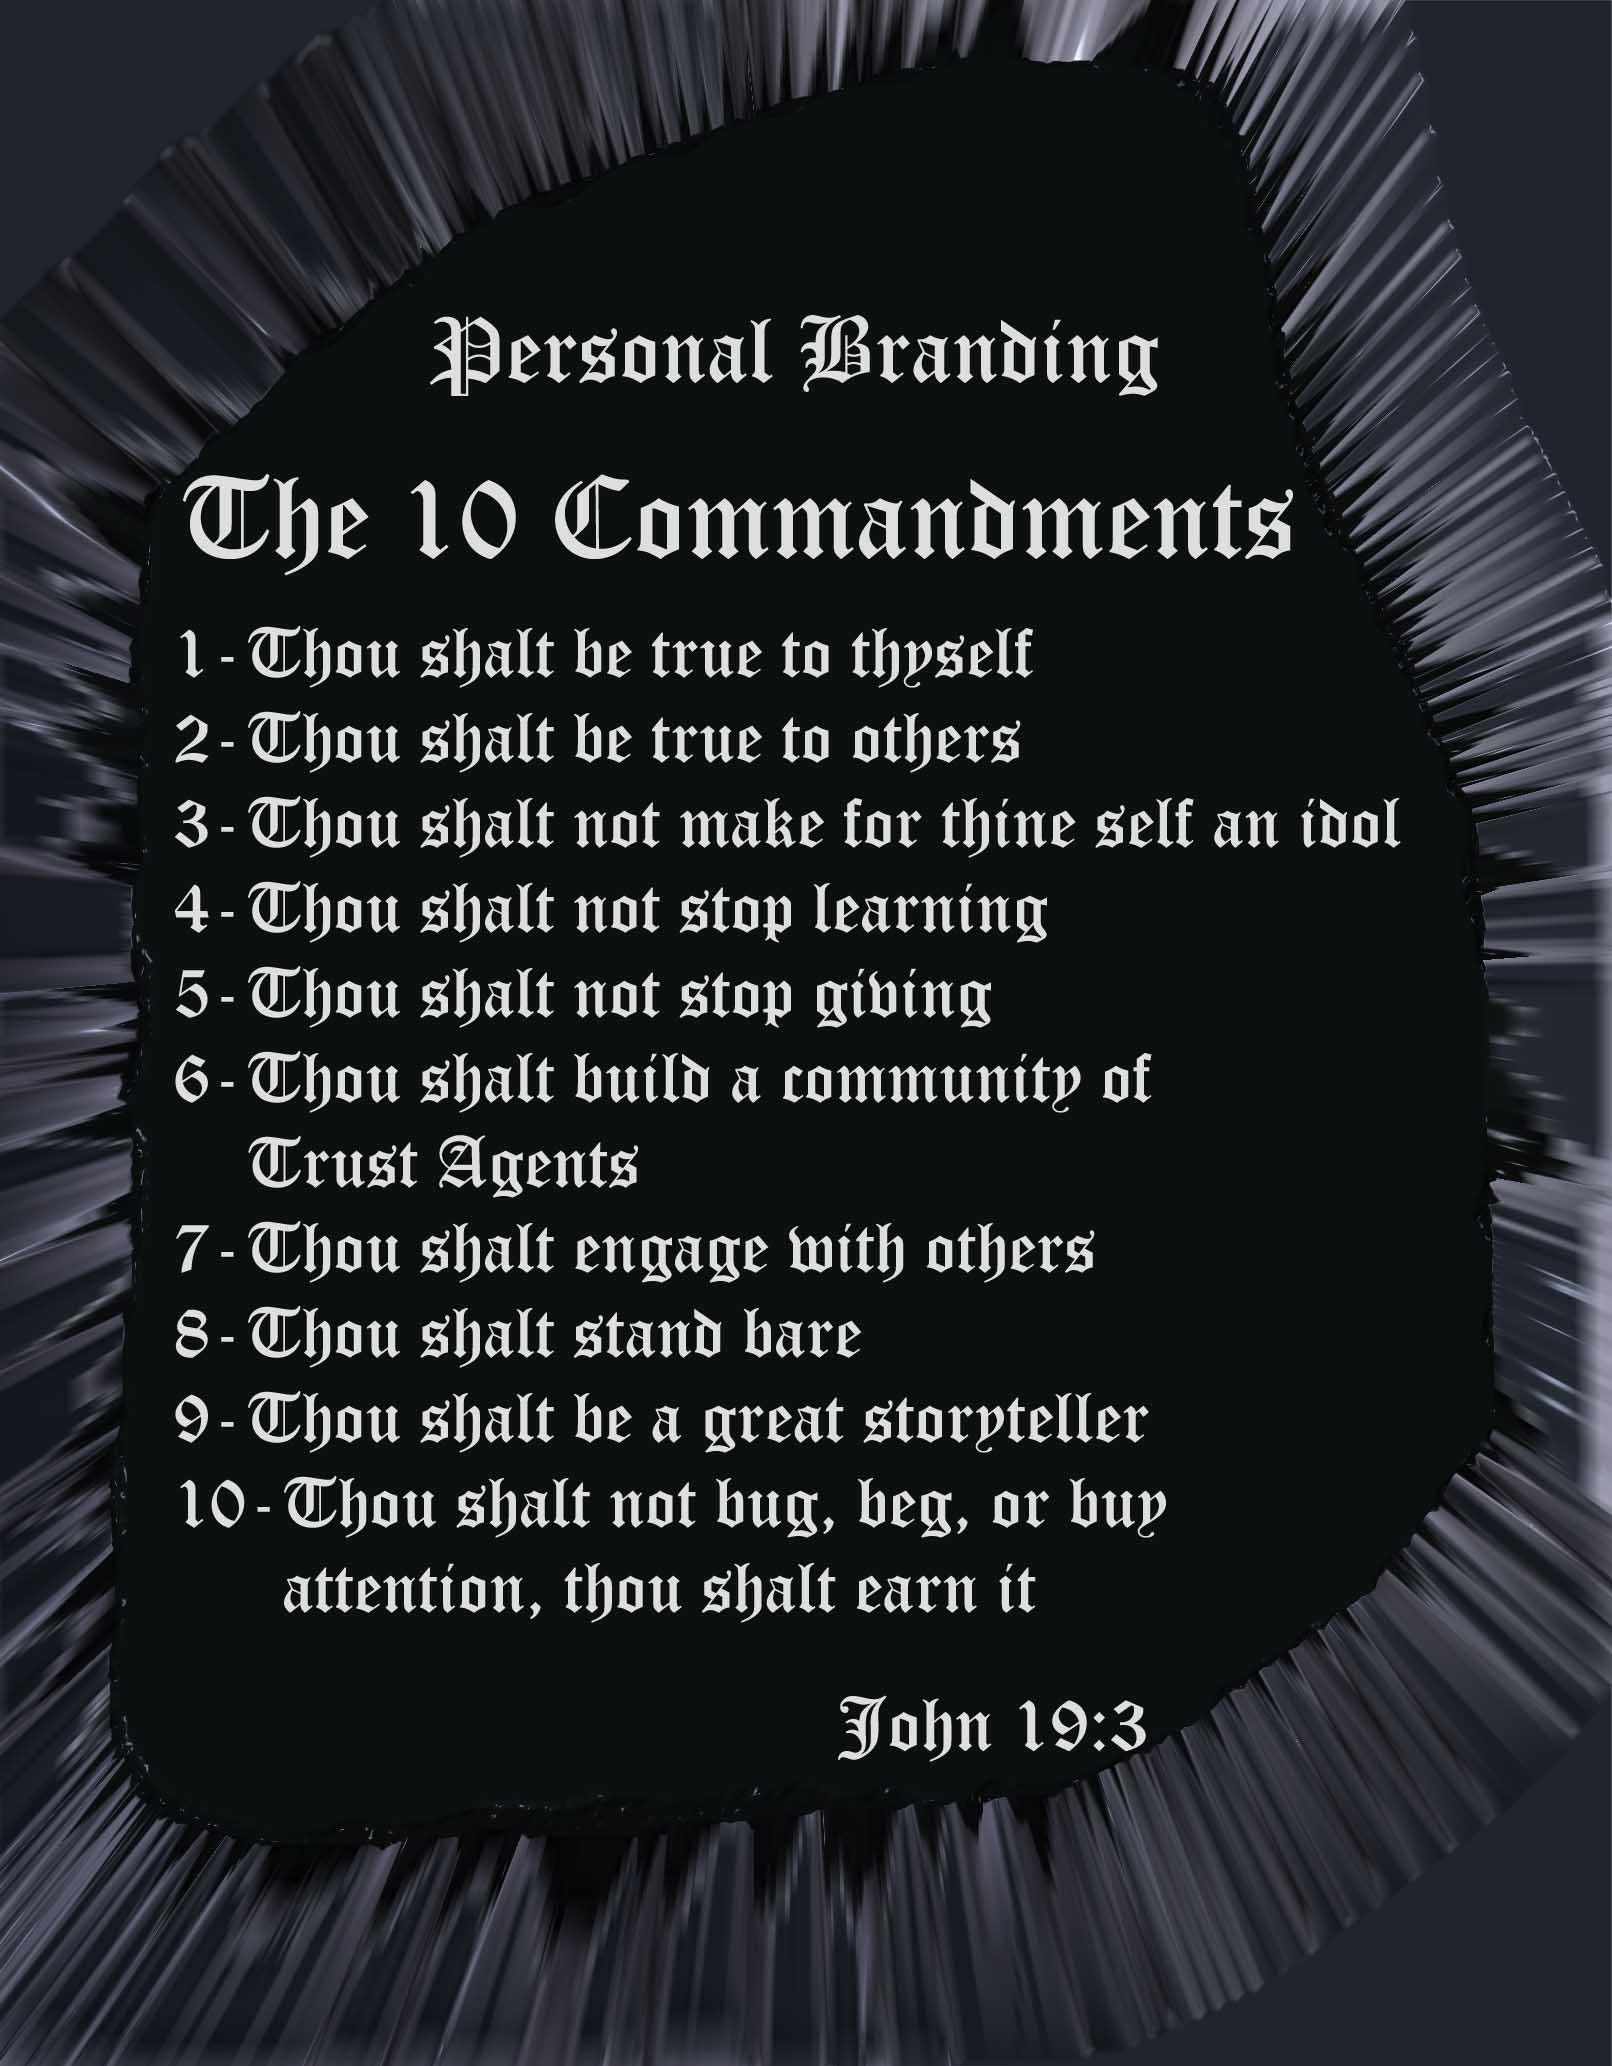 10 Commandments of Personal Branding